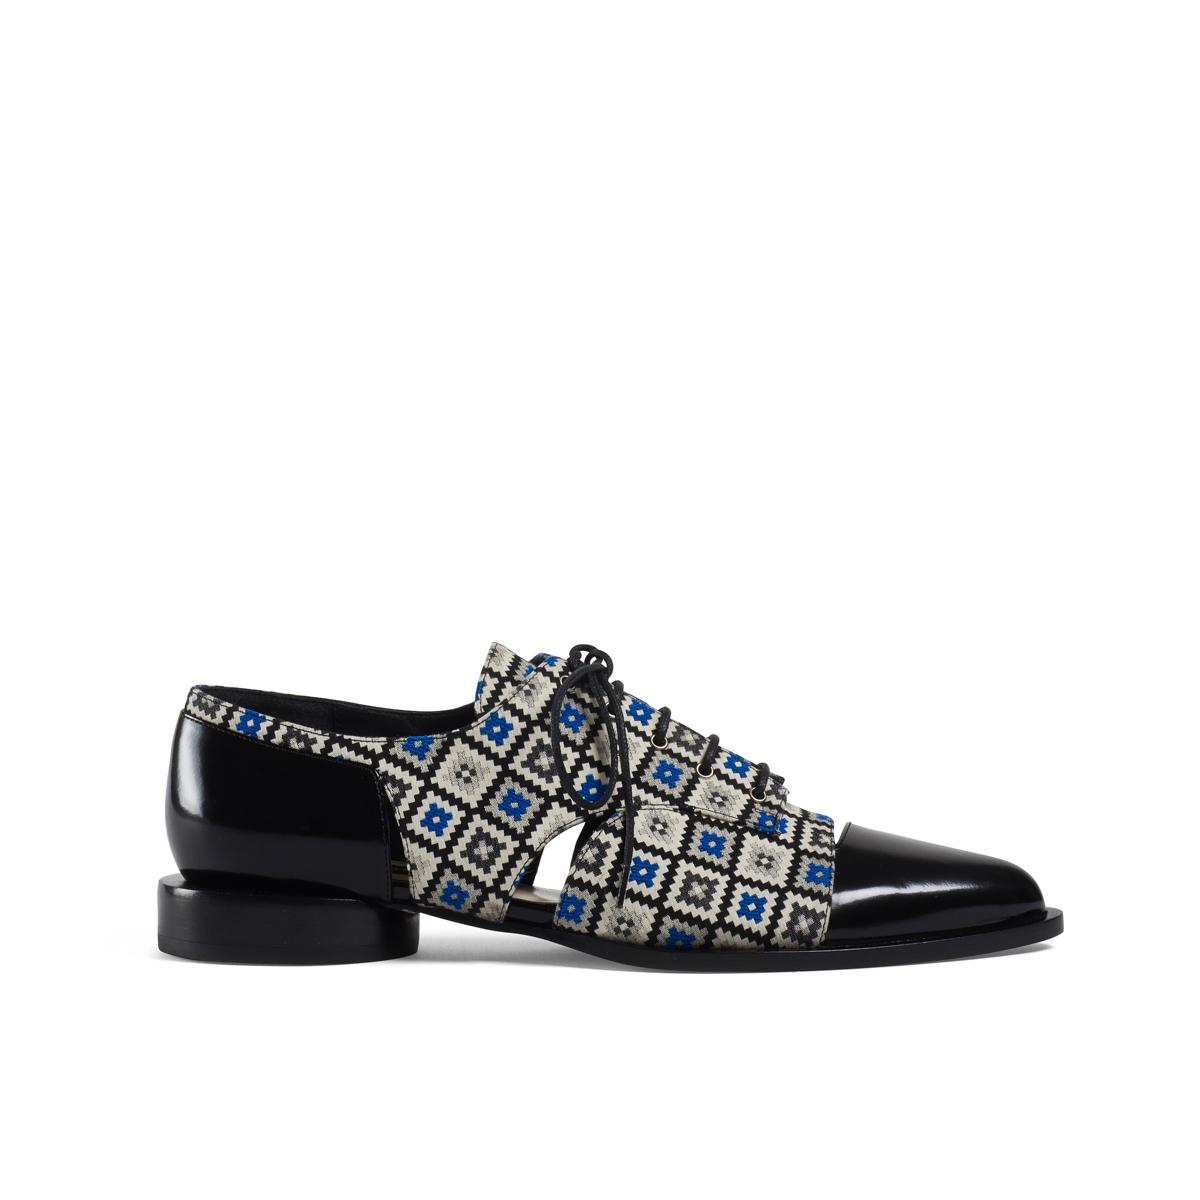 044_alaintondowski_springsummer2017_shoes_3001